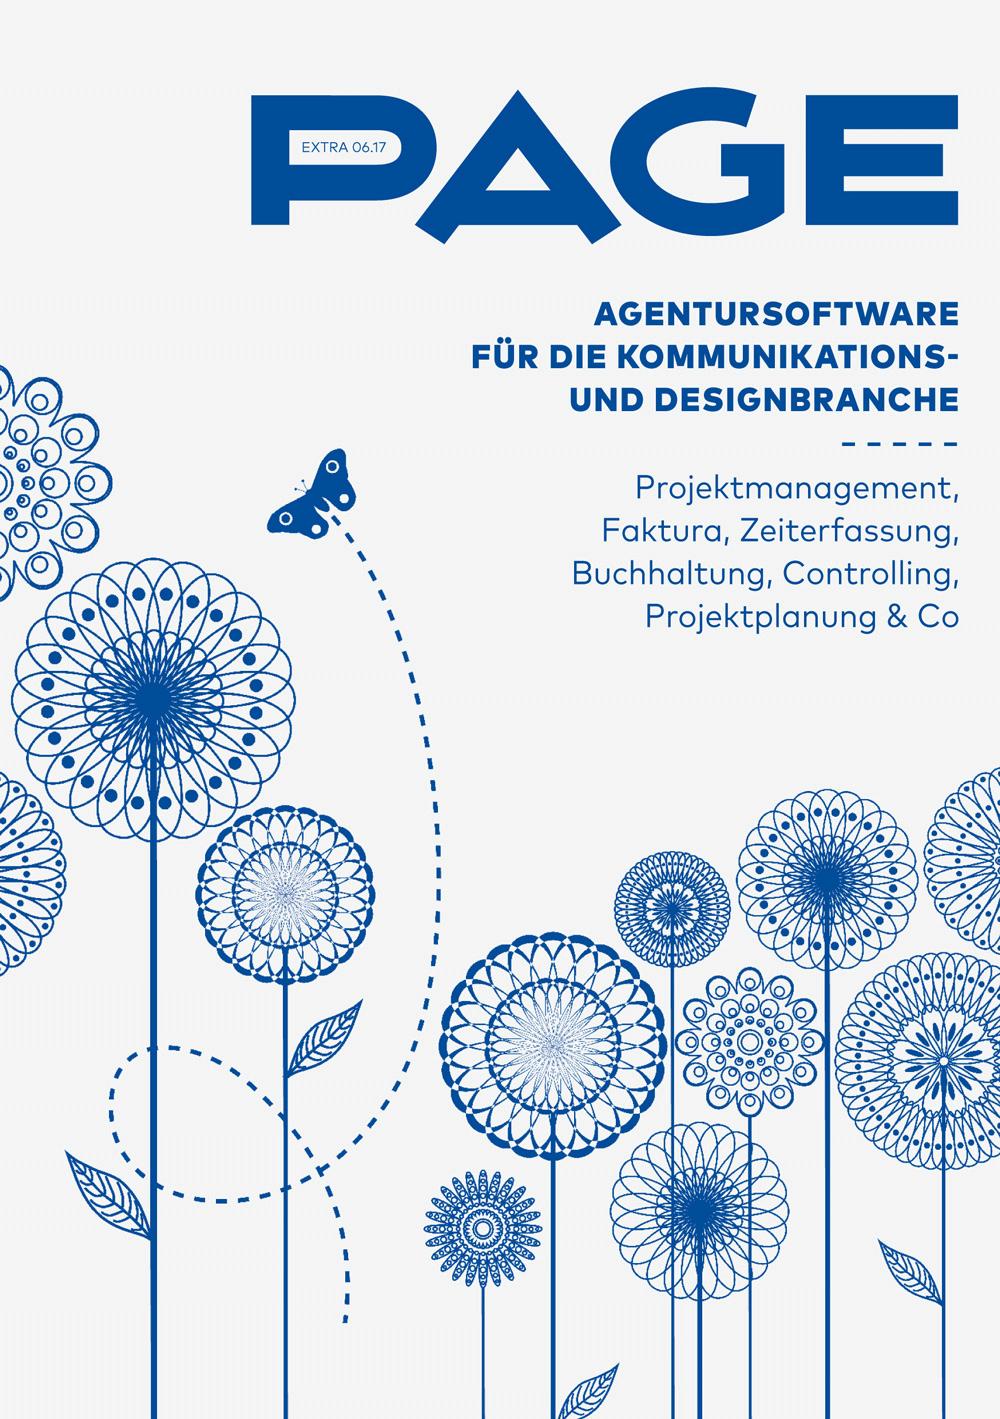 Produkt: eDossier: »PAGE Extra Agentursoftware 2017«